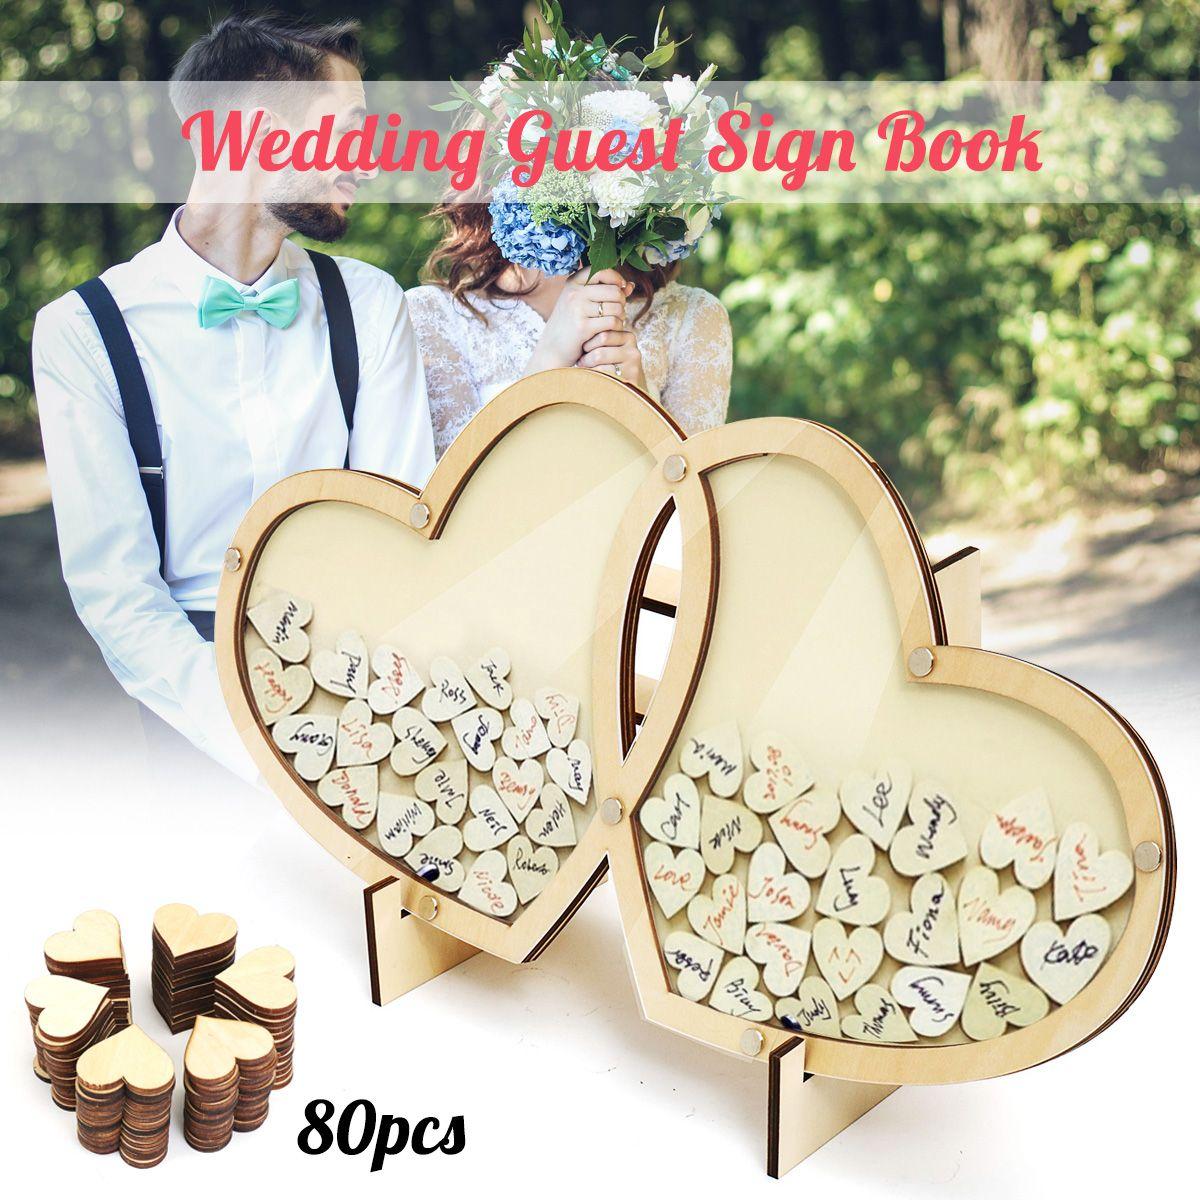 Personalized Hearts Wedding Guest Book Visit Signature Sign Book 3D Wooden Double-Heart Pendant Drop Ornaments Party Decoration